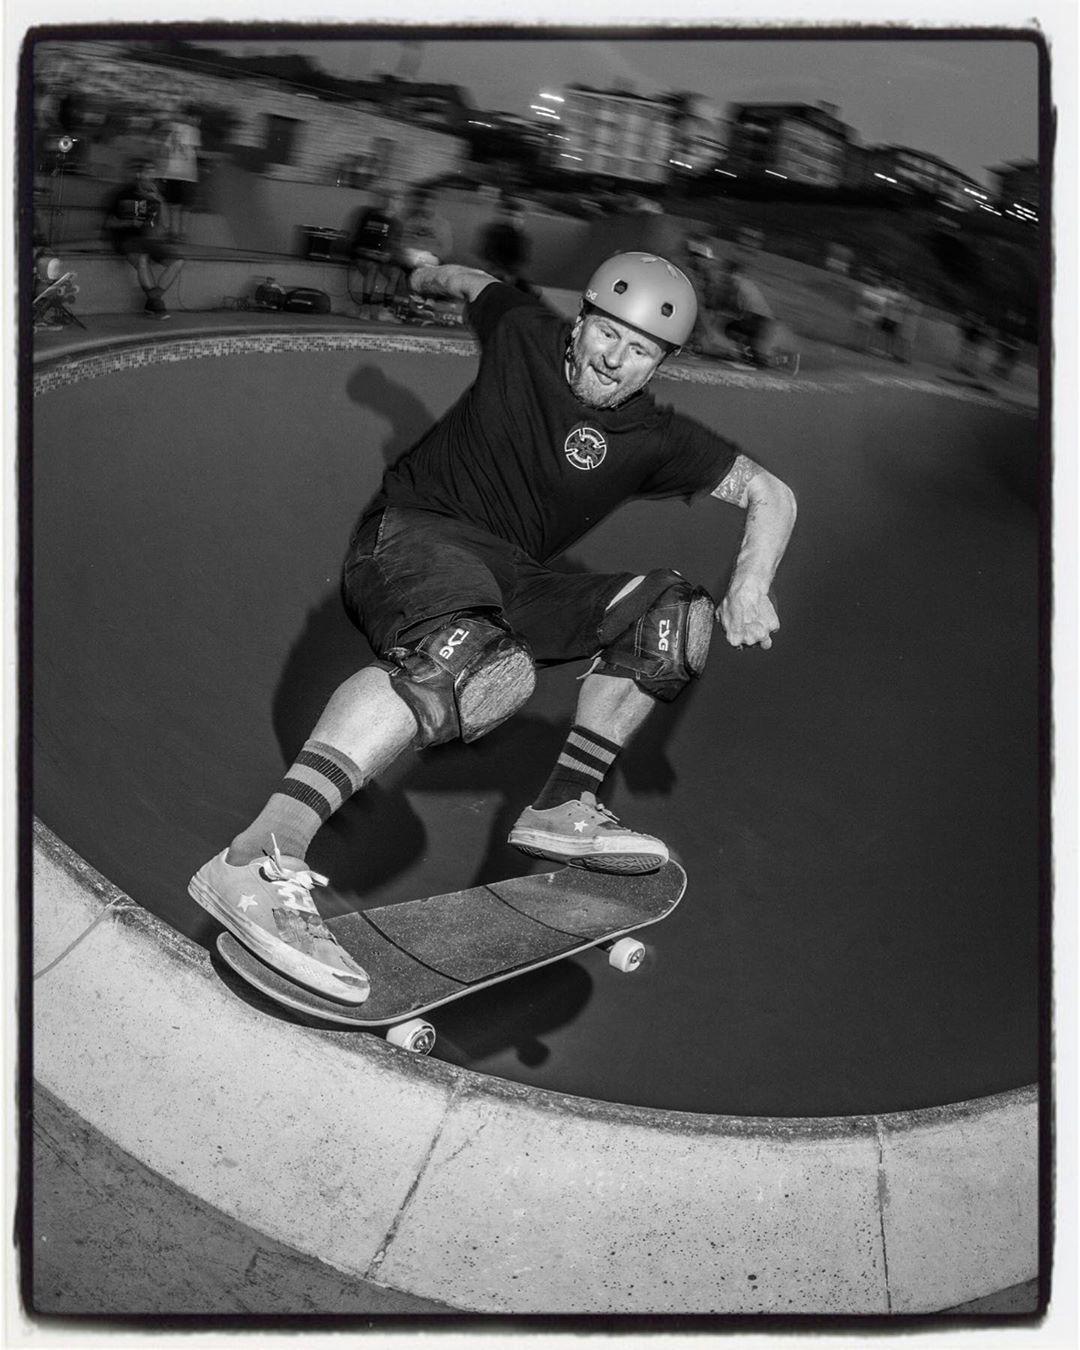 The Killer 50-50 session article from the La Kantera skatepark is online now. Anders, tailslide in the Kidney Pool. Story and more photos over here: www.bailgun.com/category/news @anderstellen @zutskateparks @ortxustrofps @lakanteraskateskola